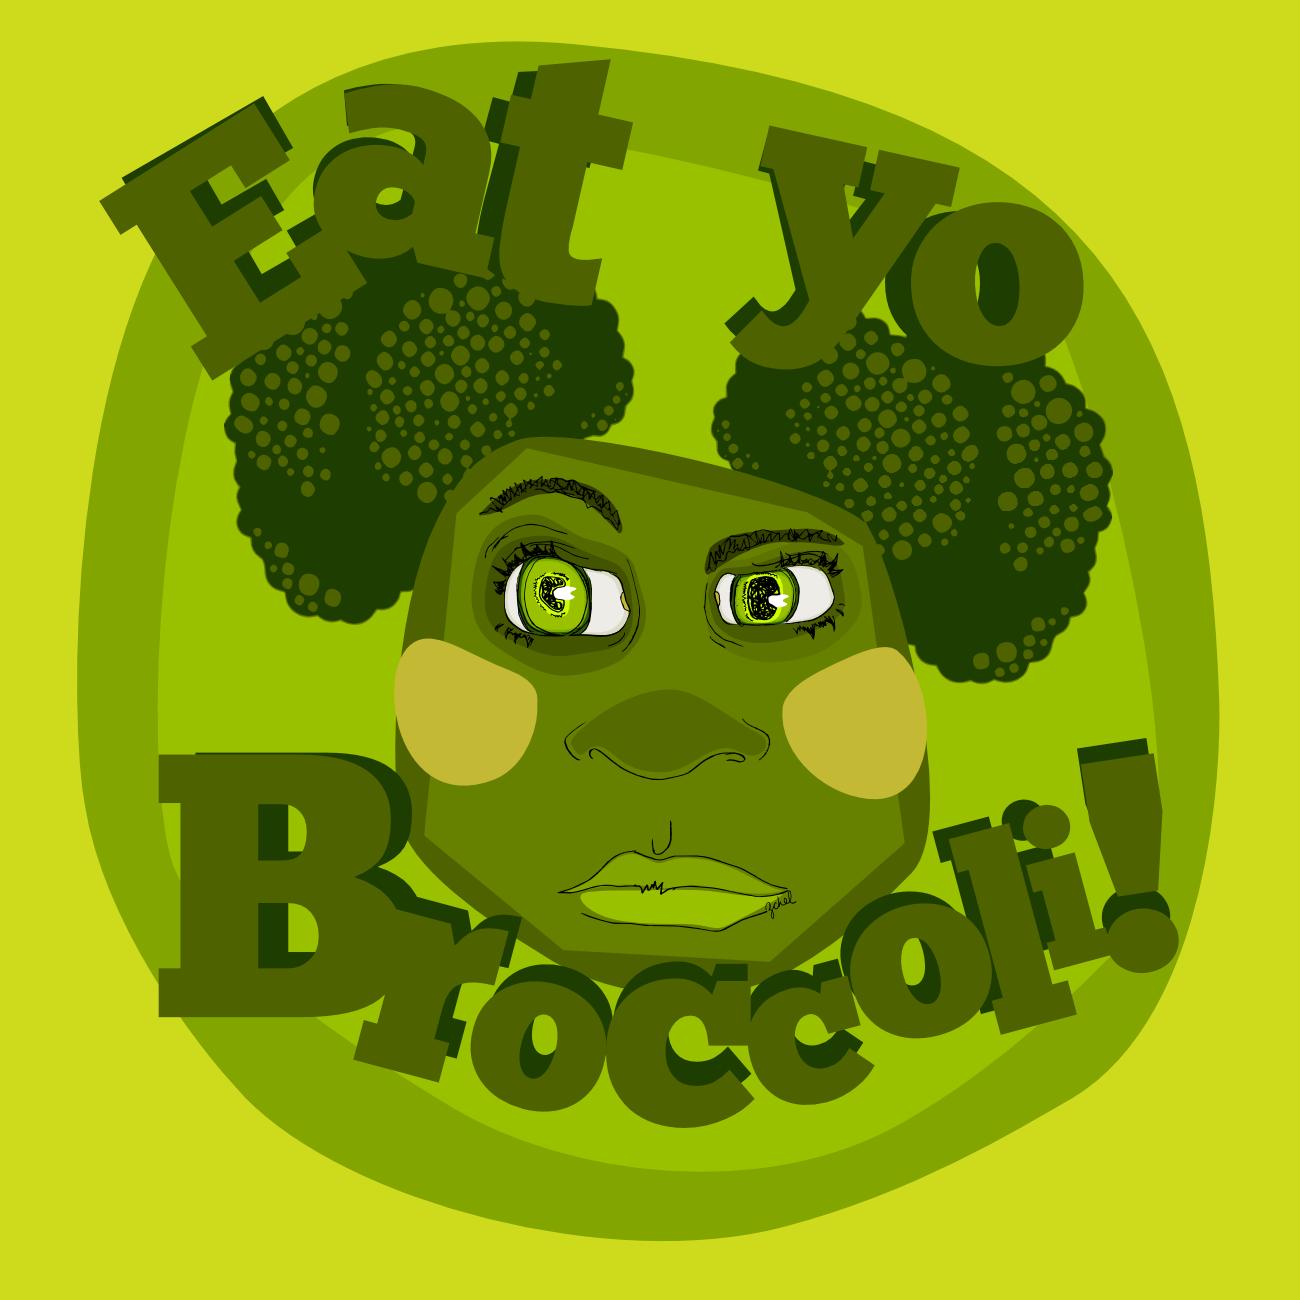 eat your broccoli